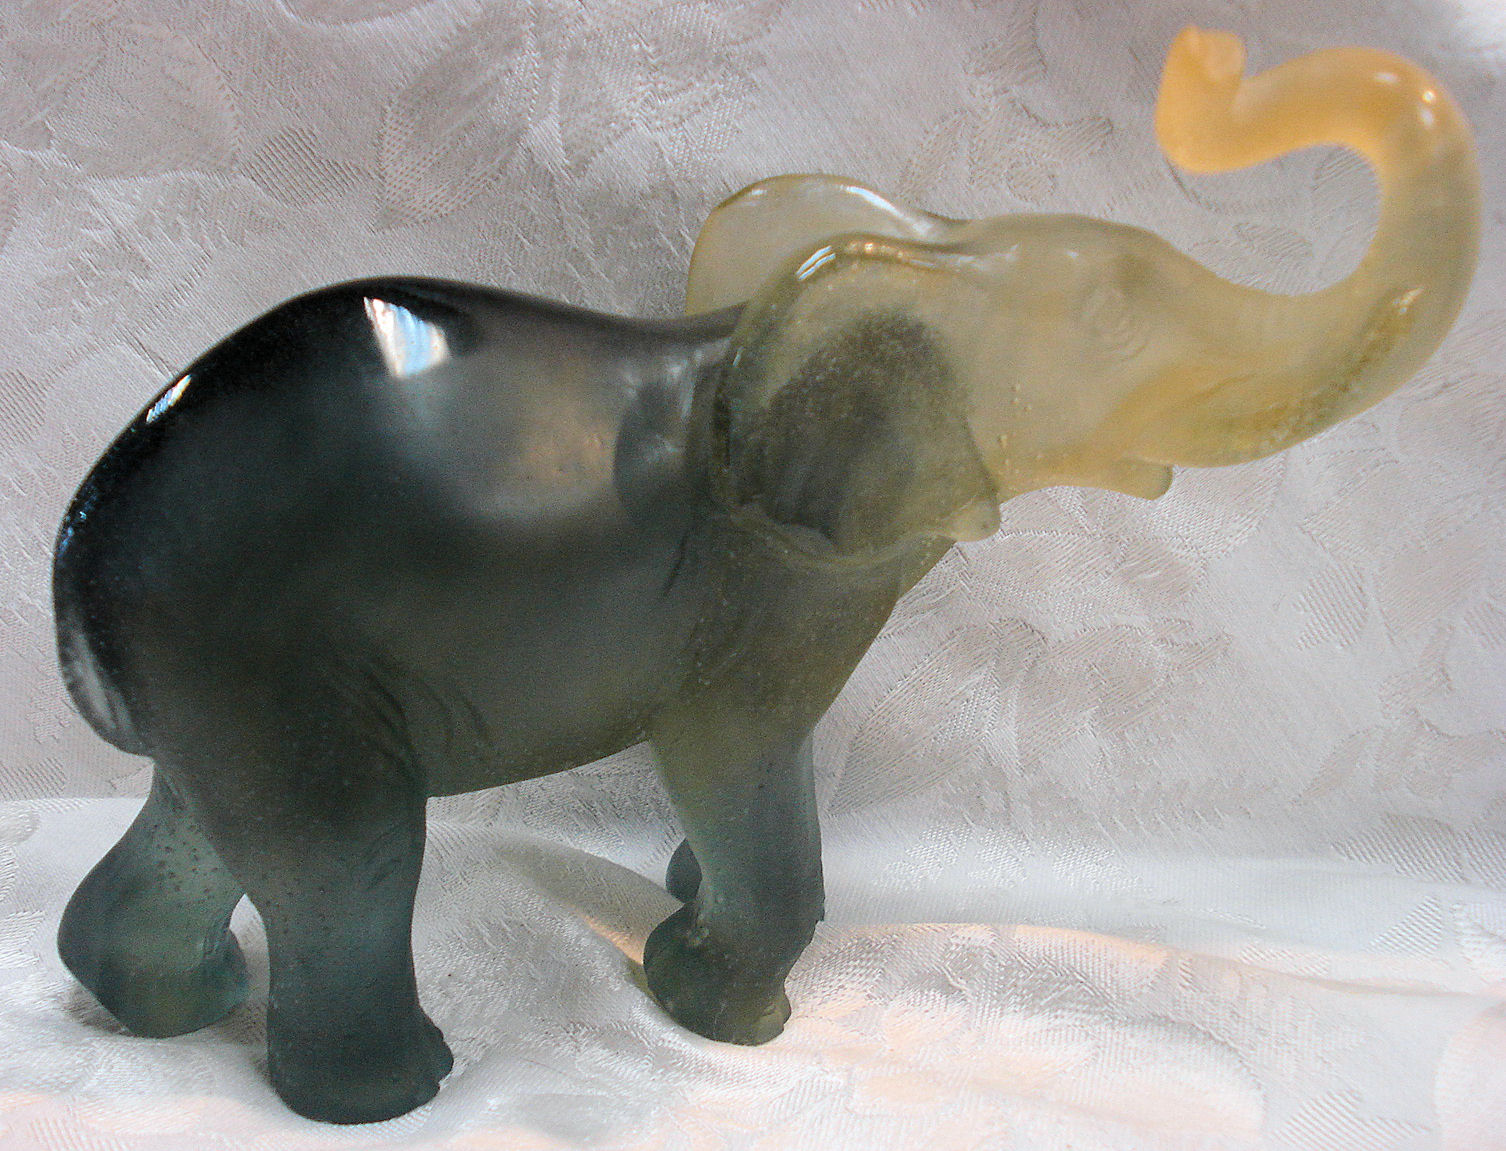 elefante_2014-10-02_10-31-51.jpg